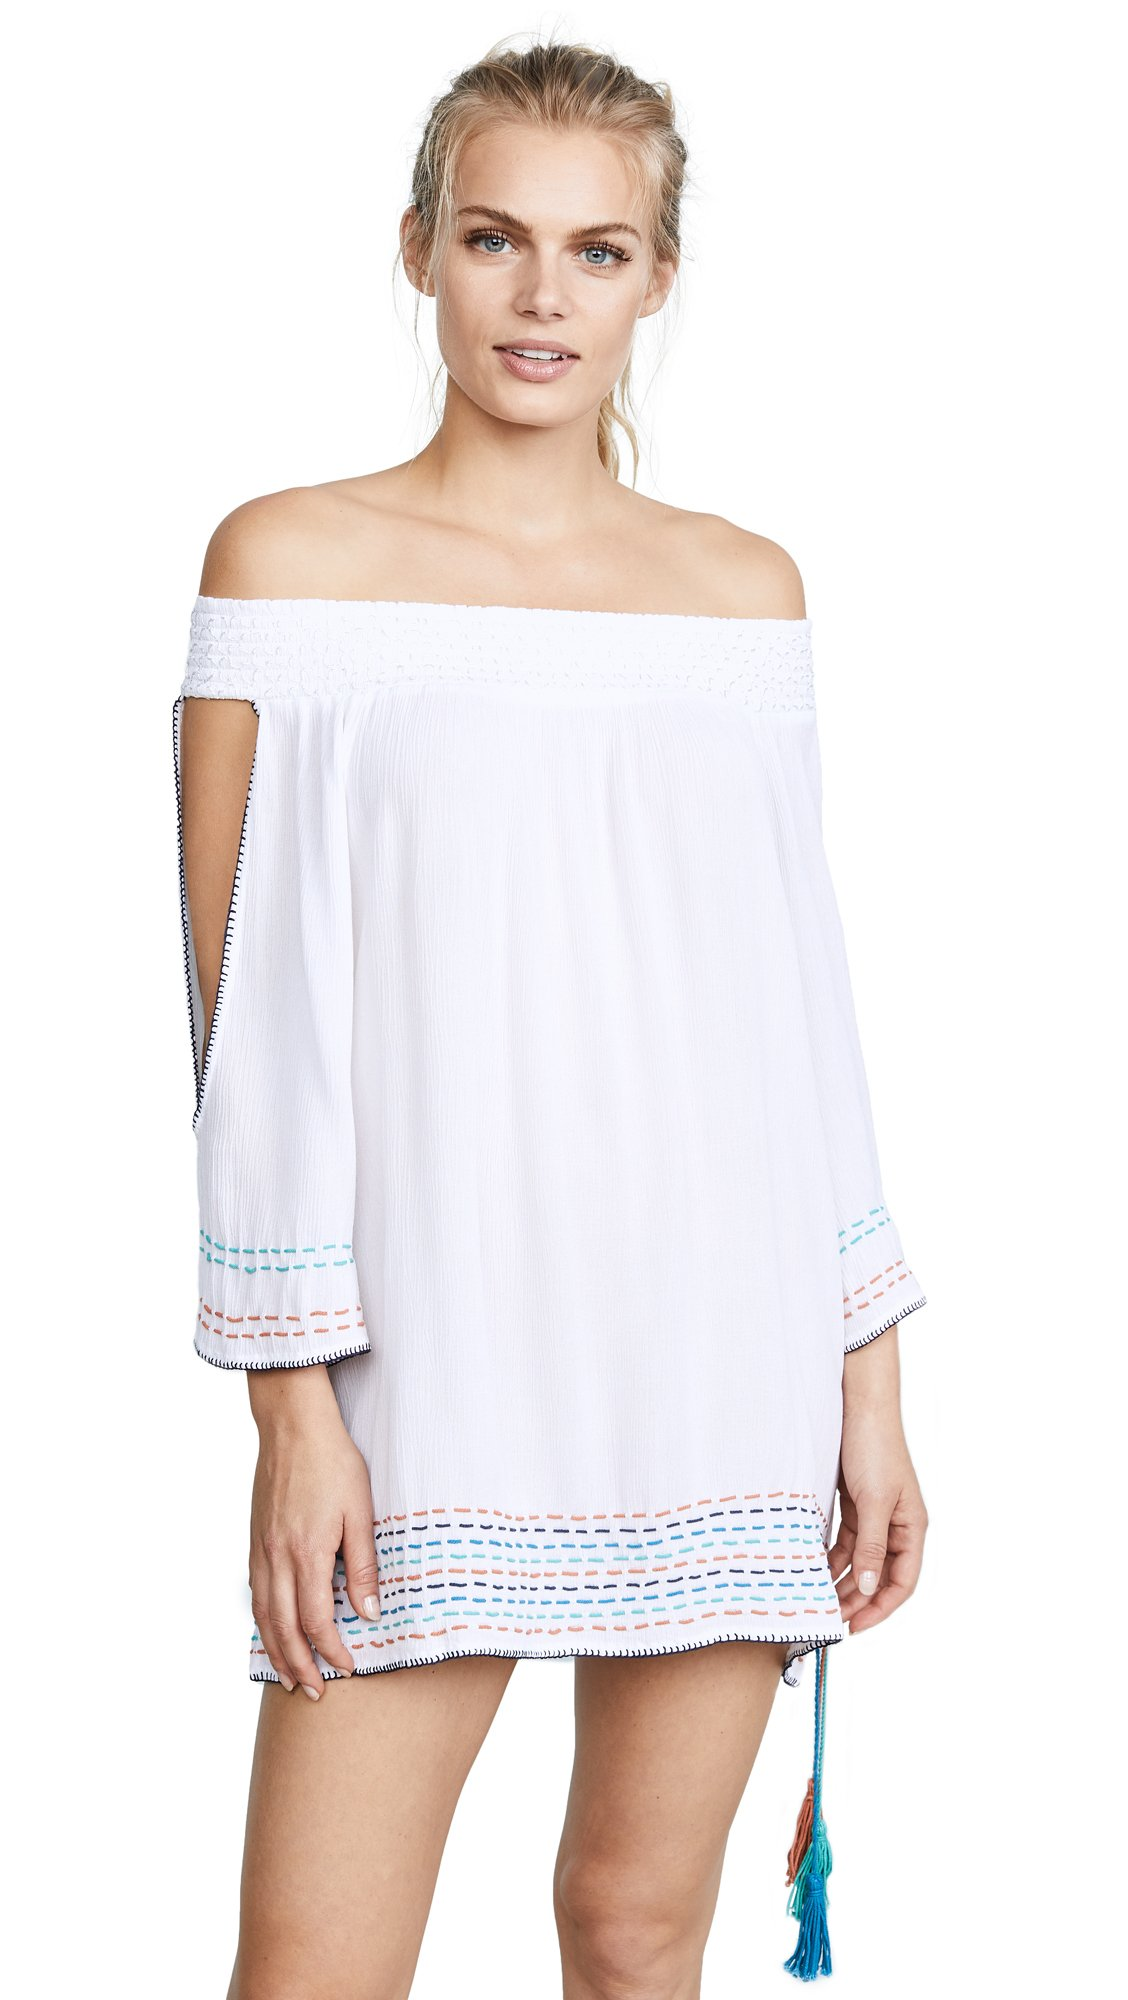 OndadeMar Women's Solids Short Dress, White, Large